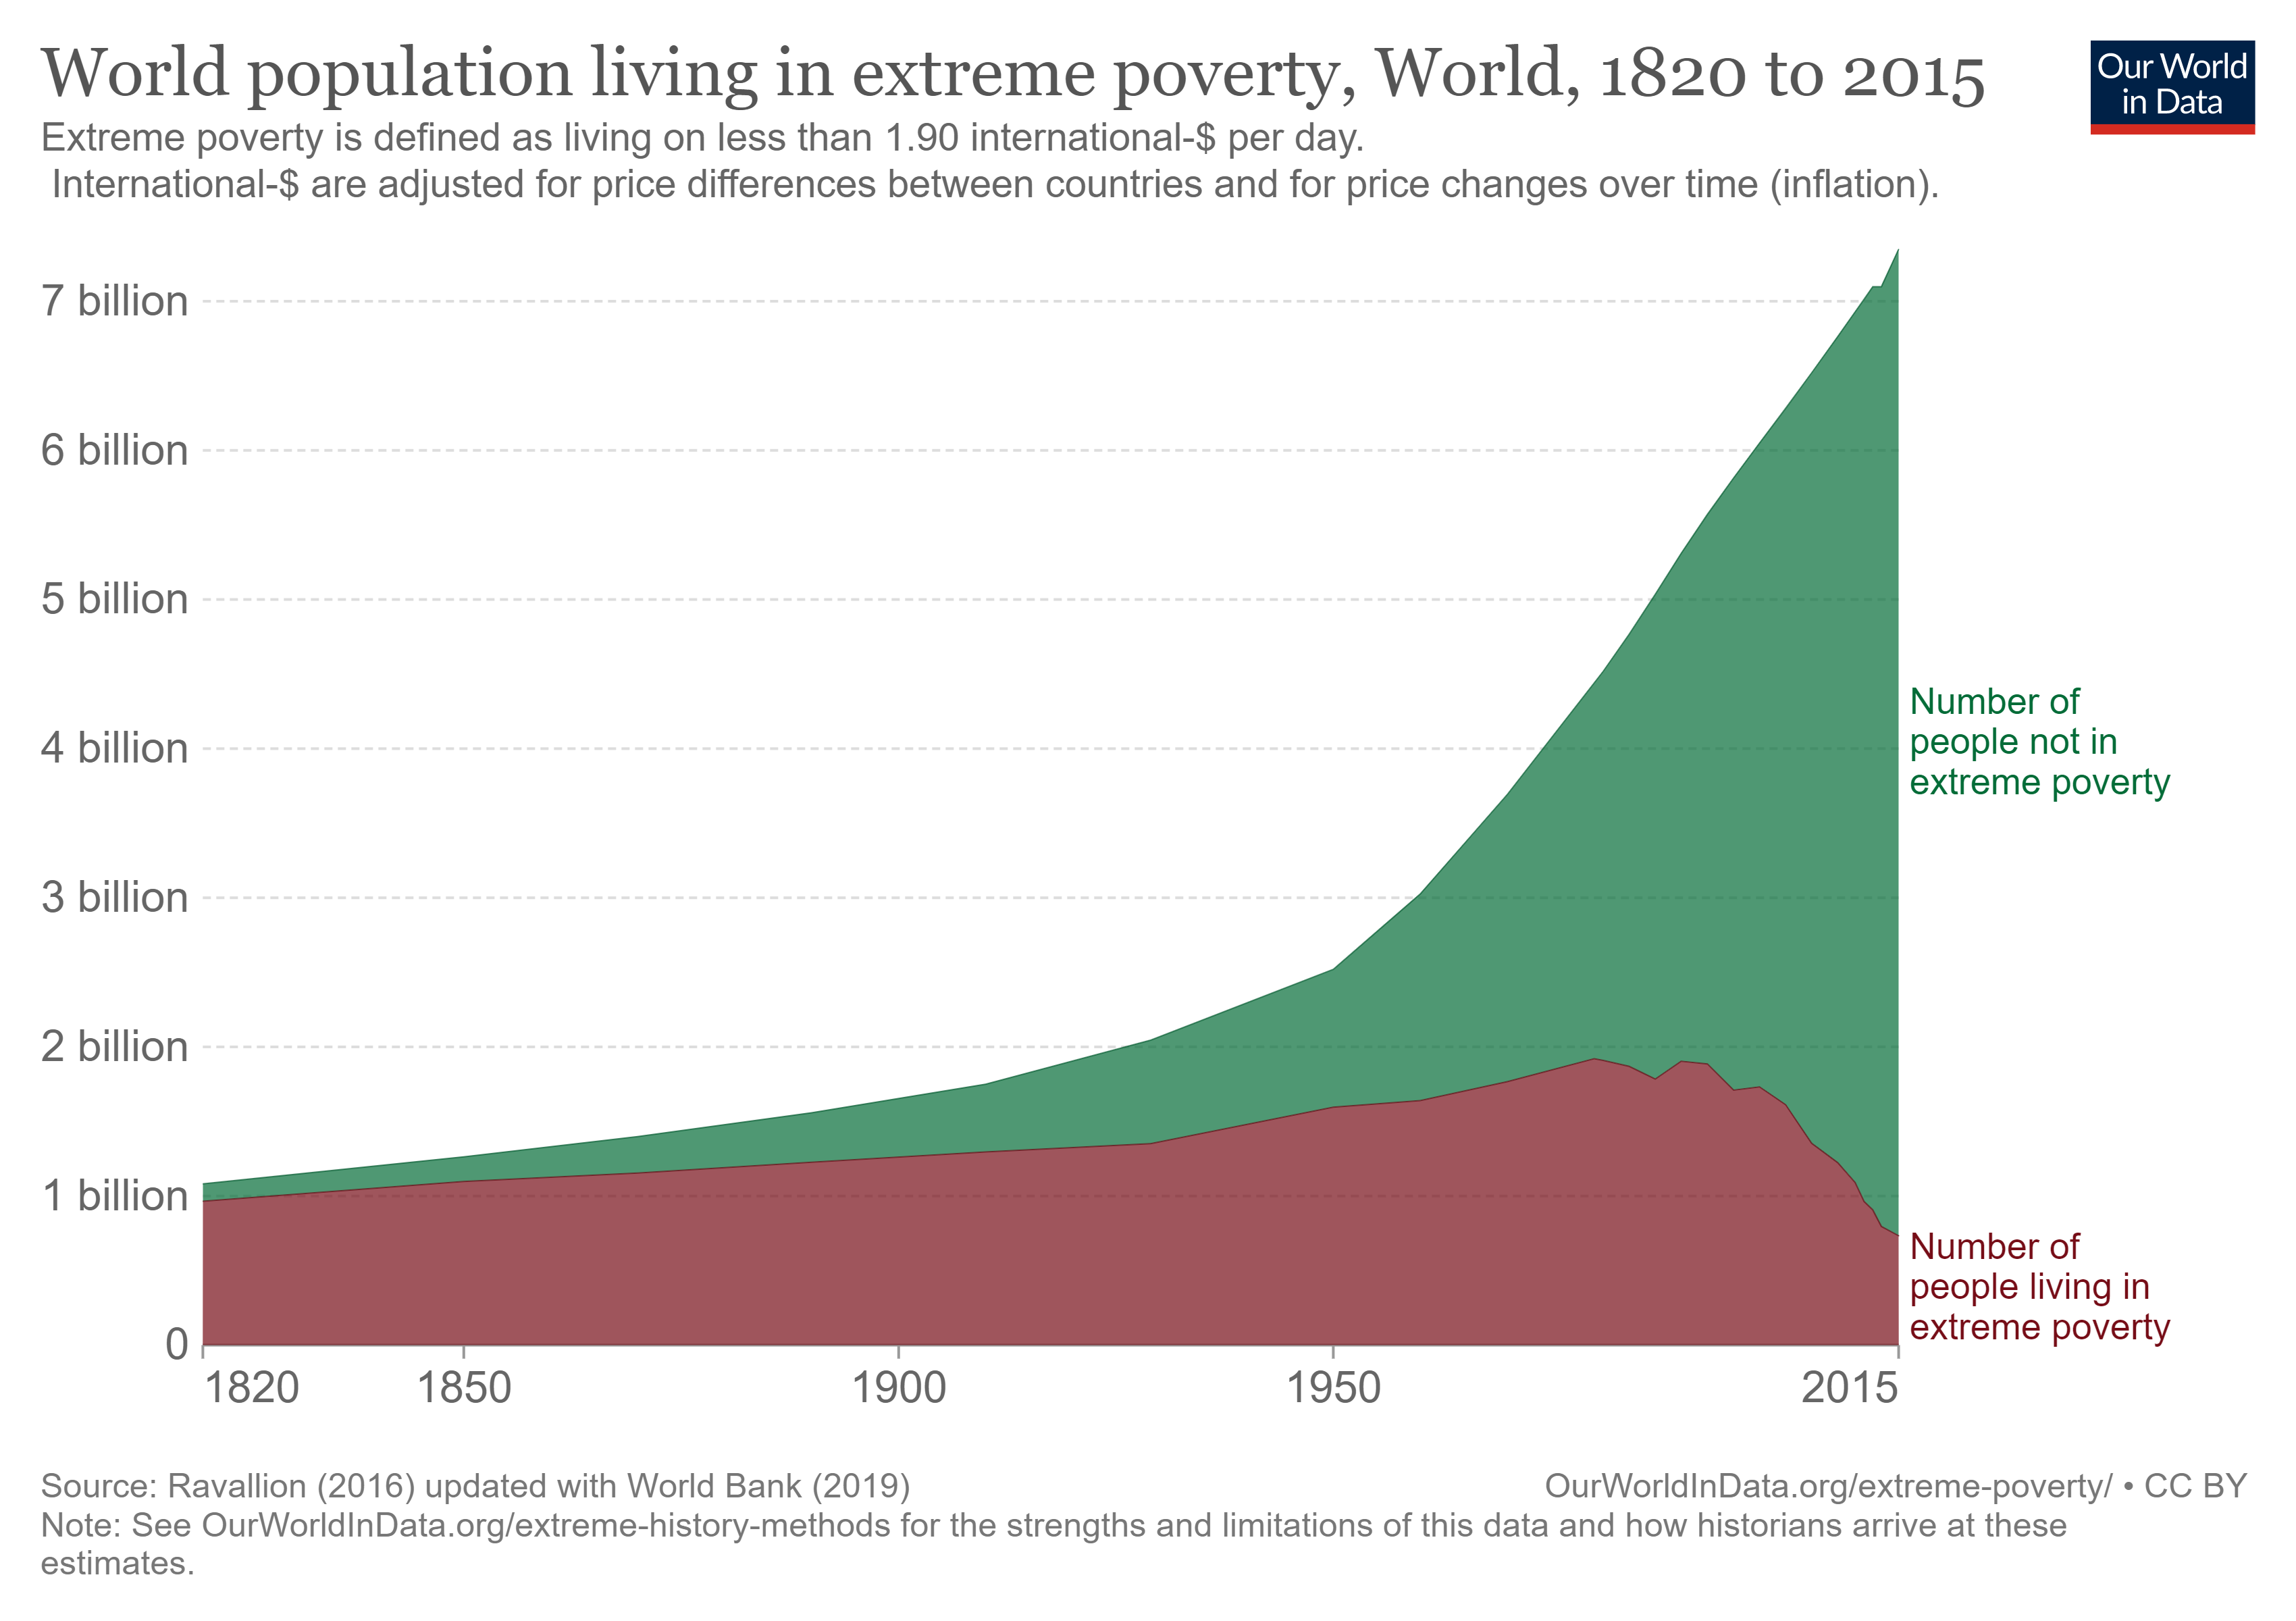 População vivendo na pobreza extrema